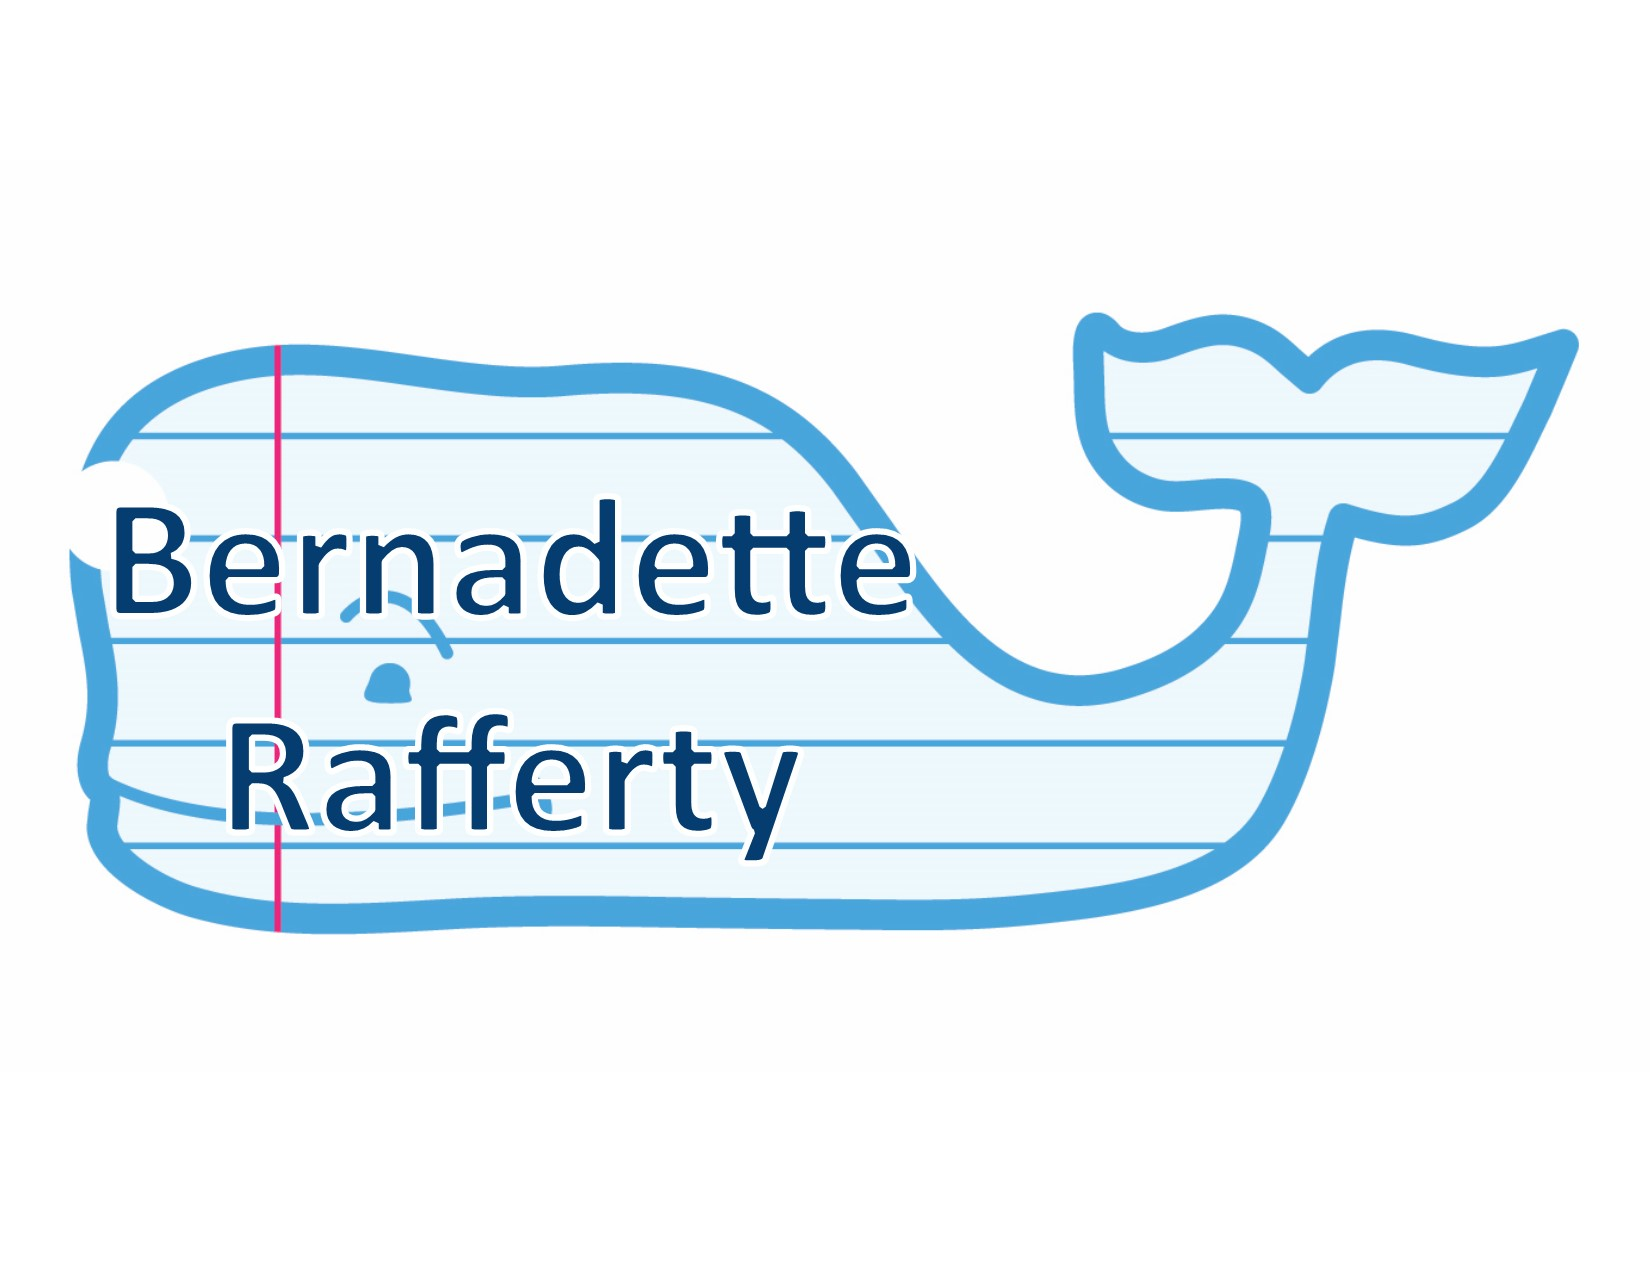 Rafferty, Bernadette.jpg